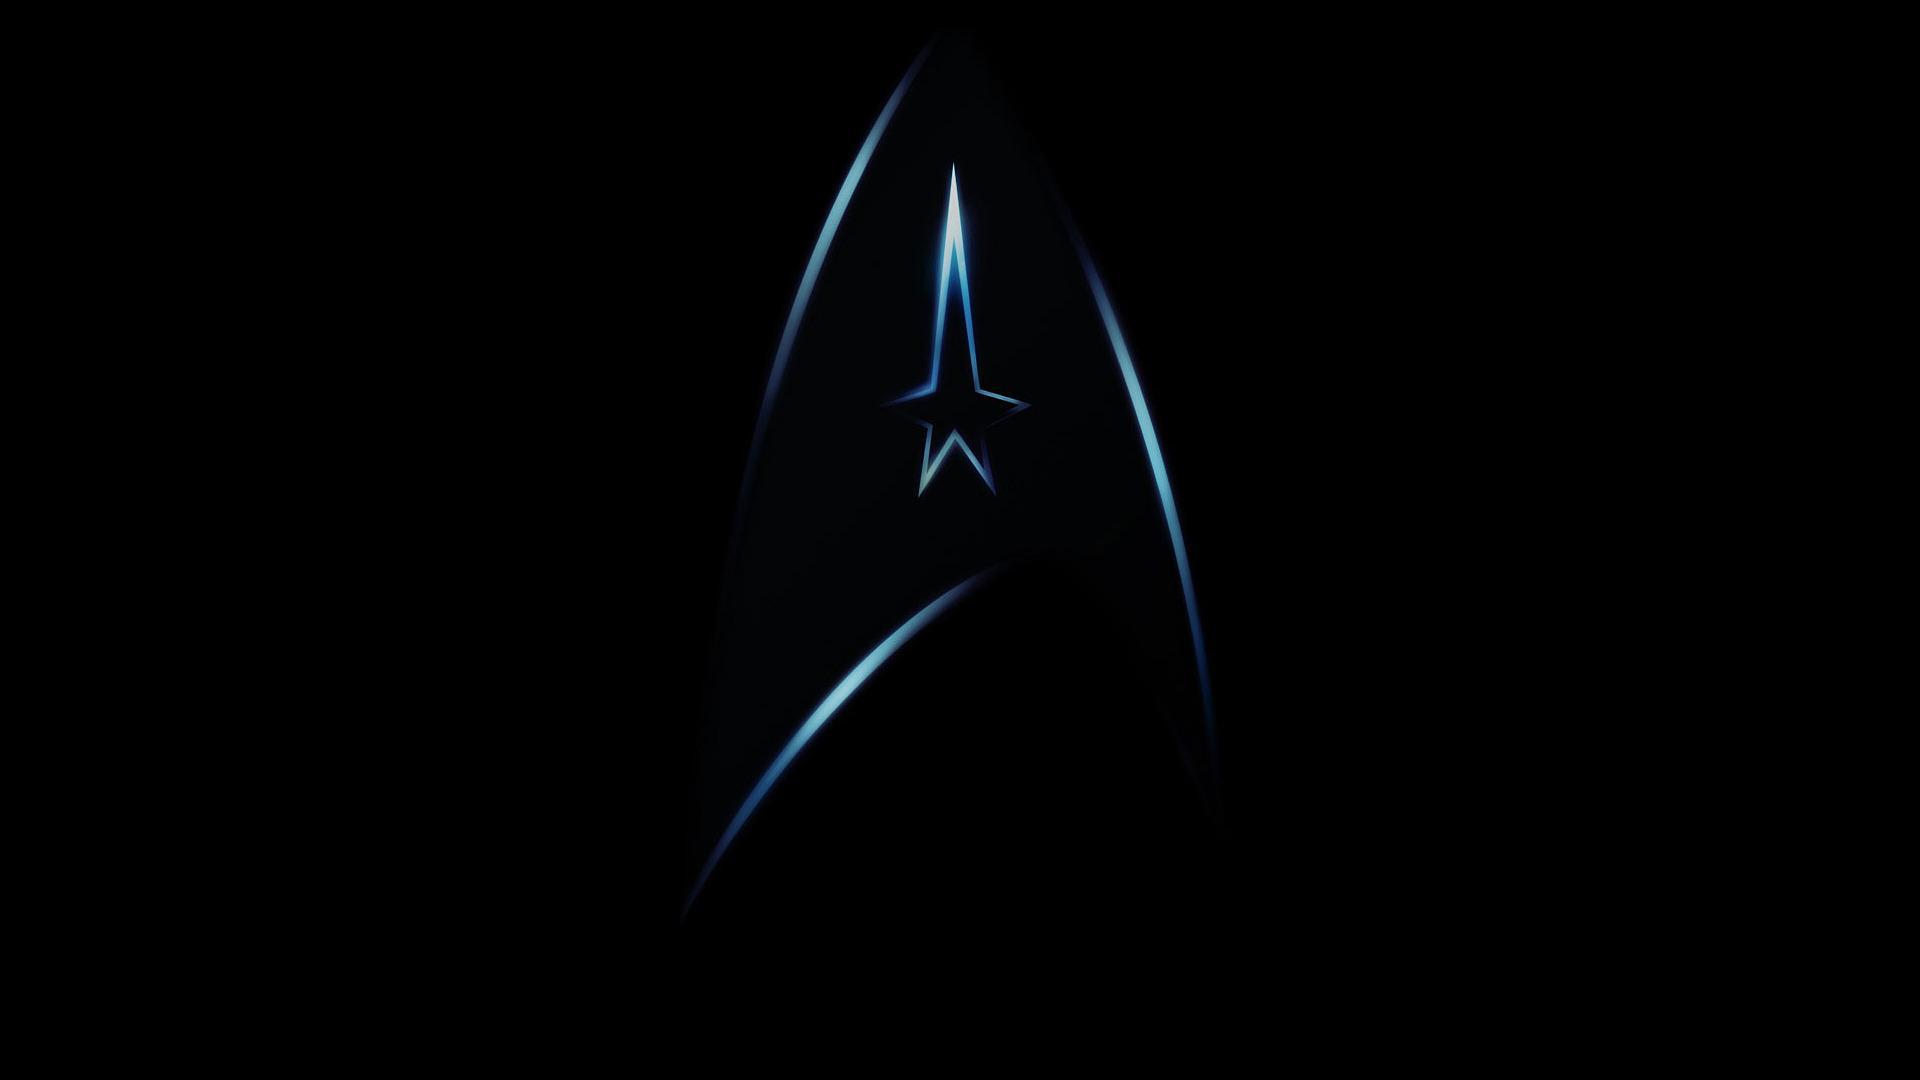 Star Trek Desktop Wallpapers Top Free Star Trek Desktop